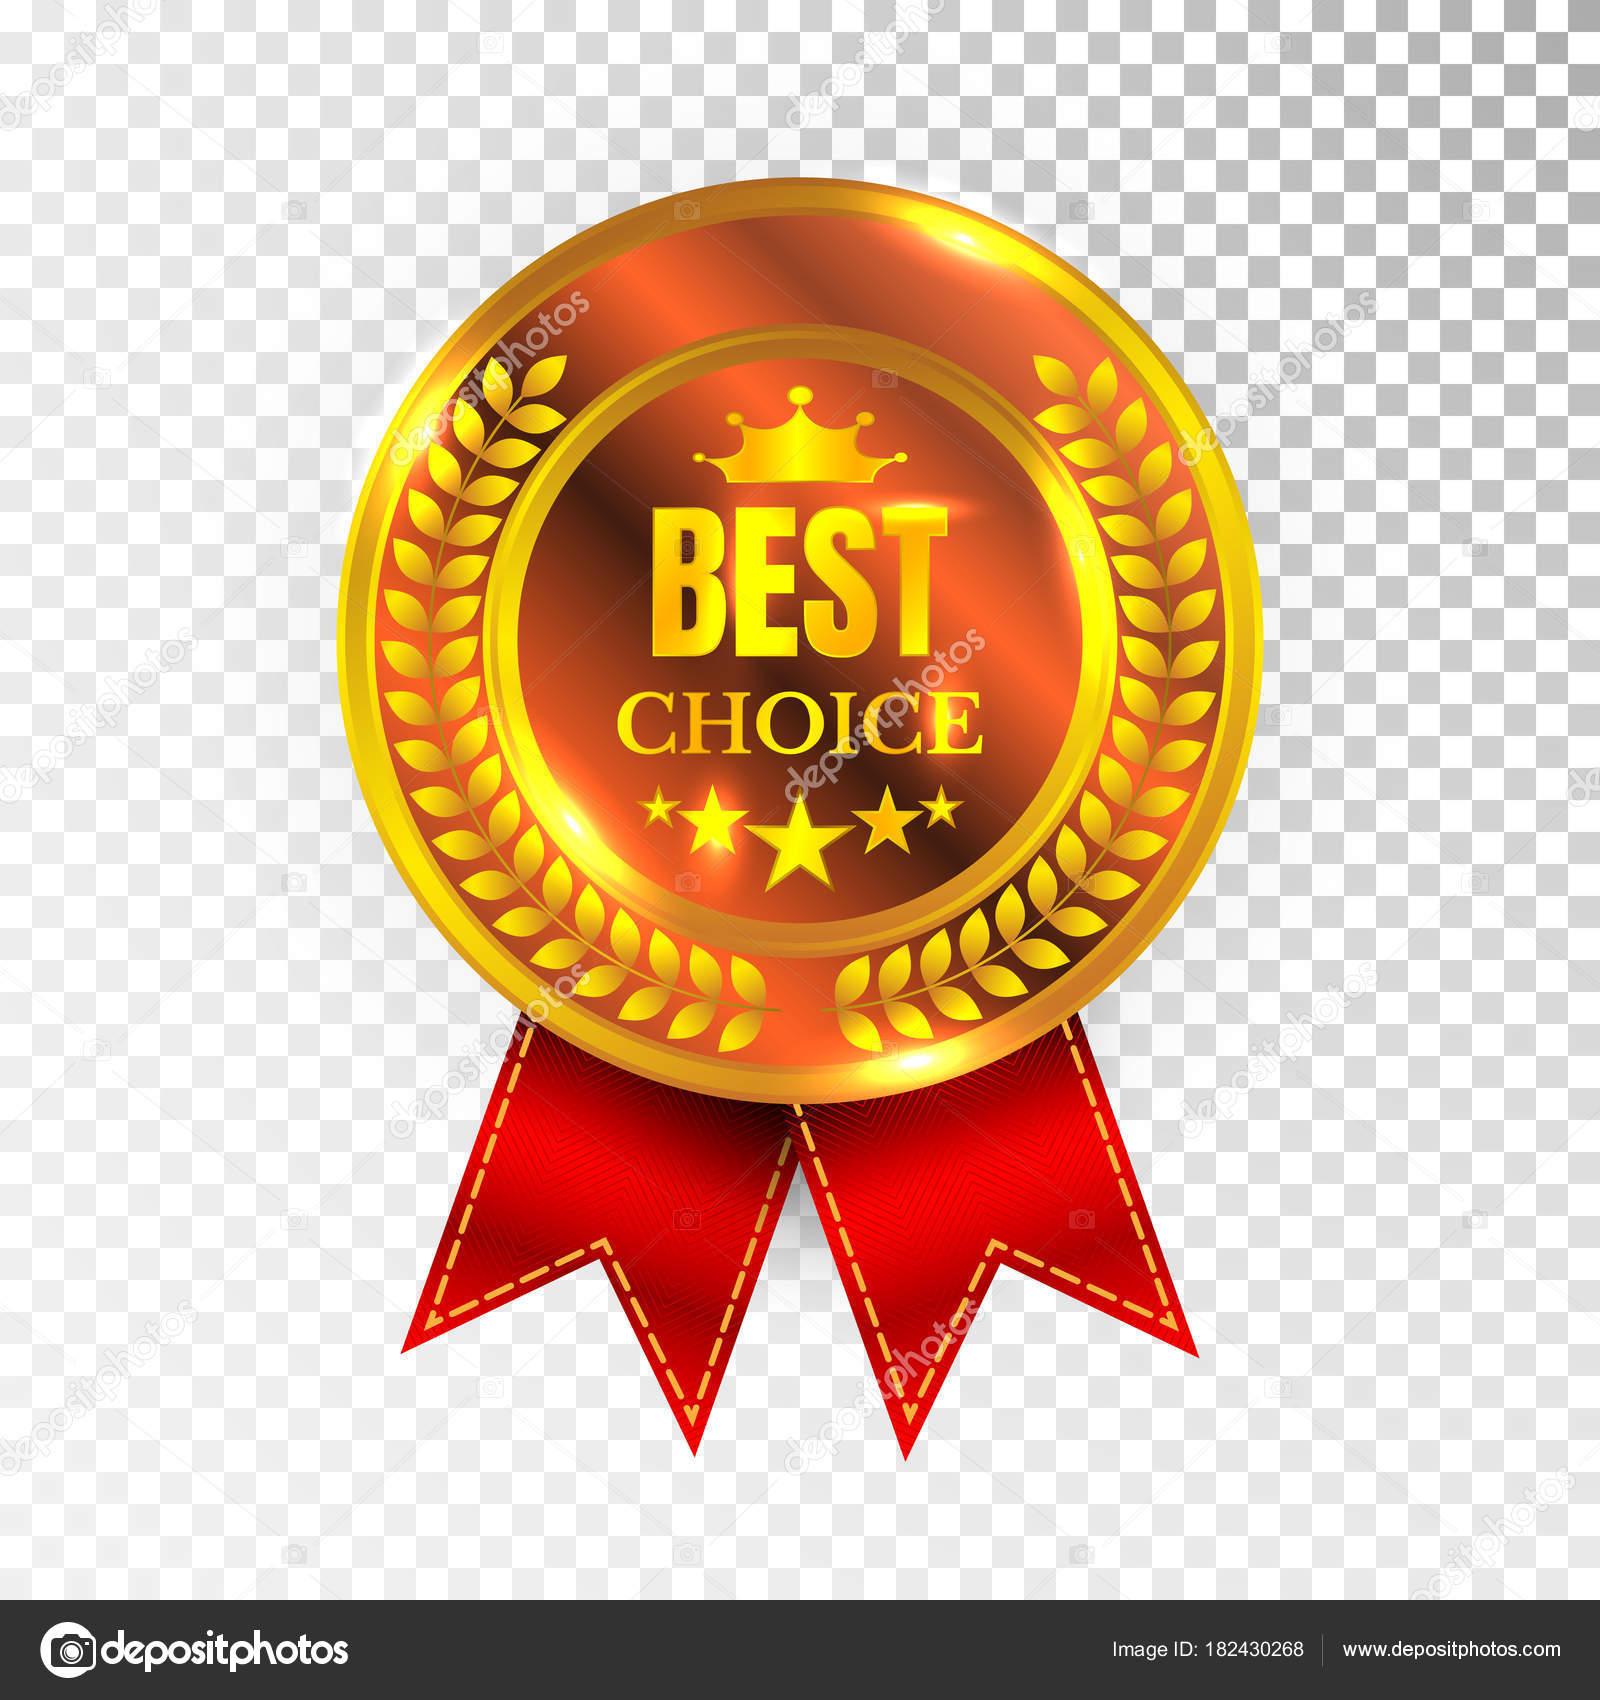 gold best choice label illustration golden medal label icon seal